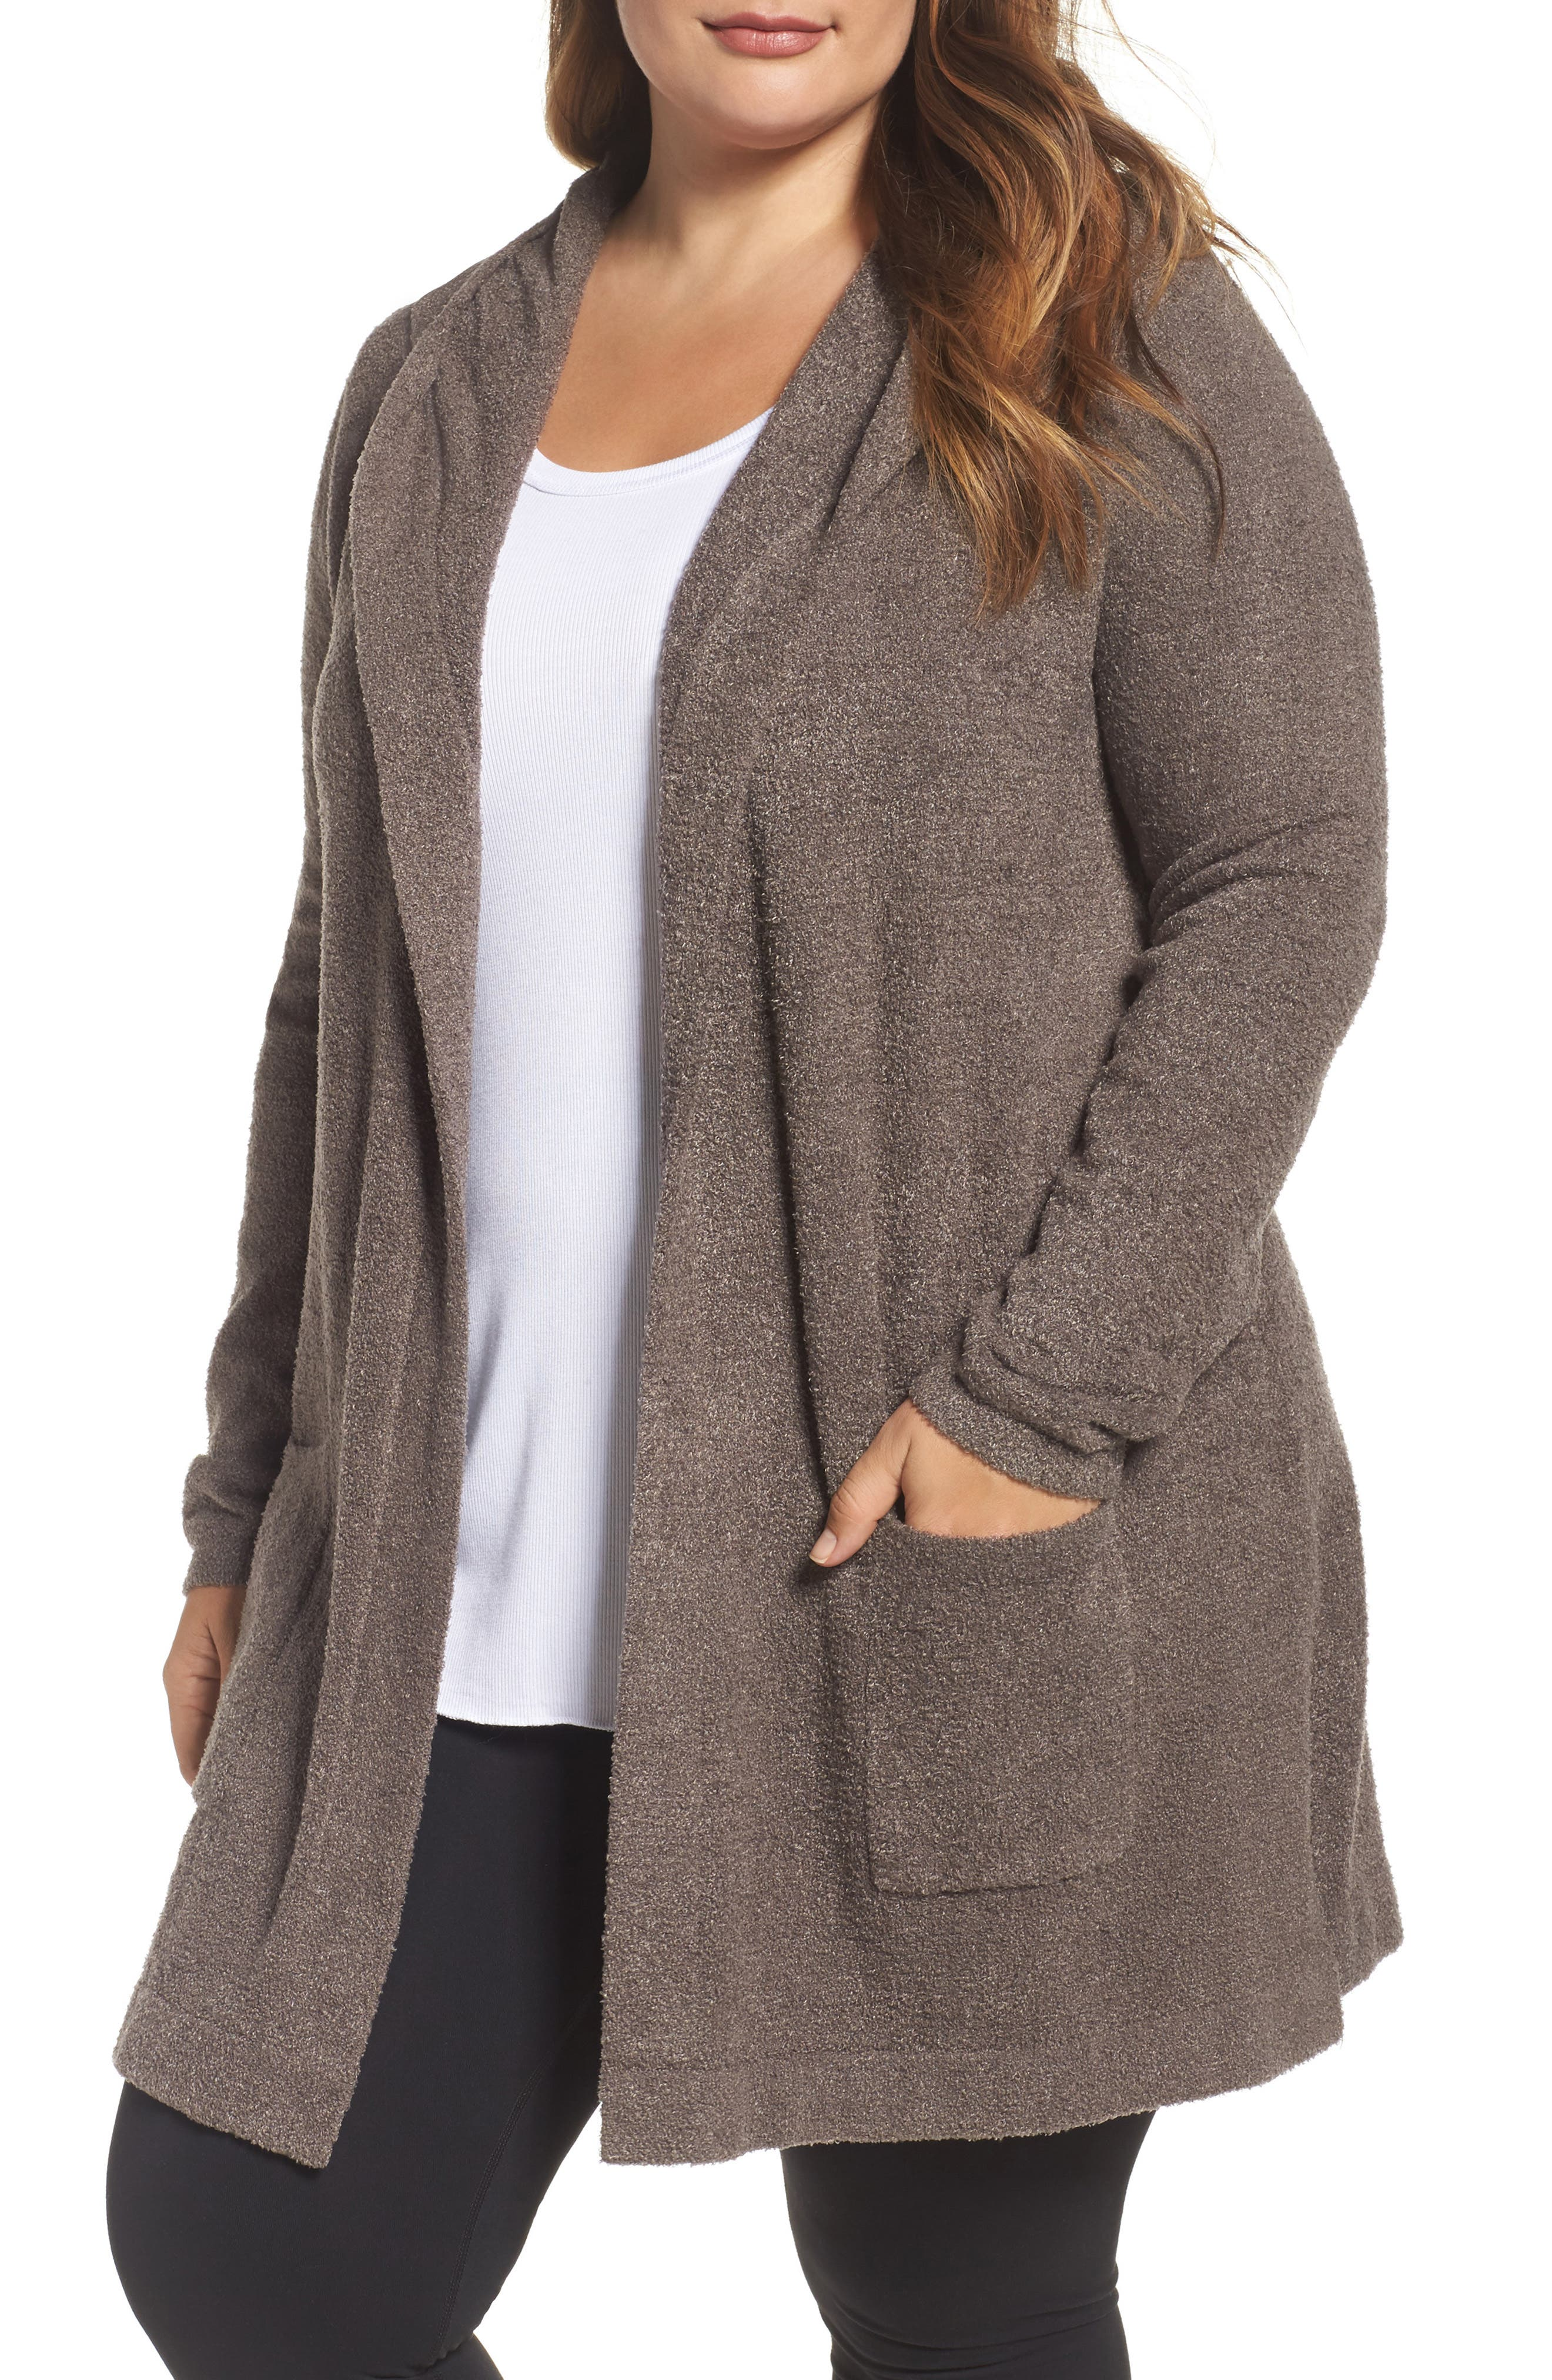 Main Image - Barefoot Dreams® Cozychic Lite® Coastal Hooded Cardigan (Plus Size)